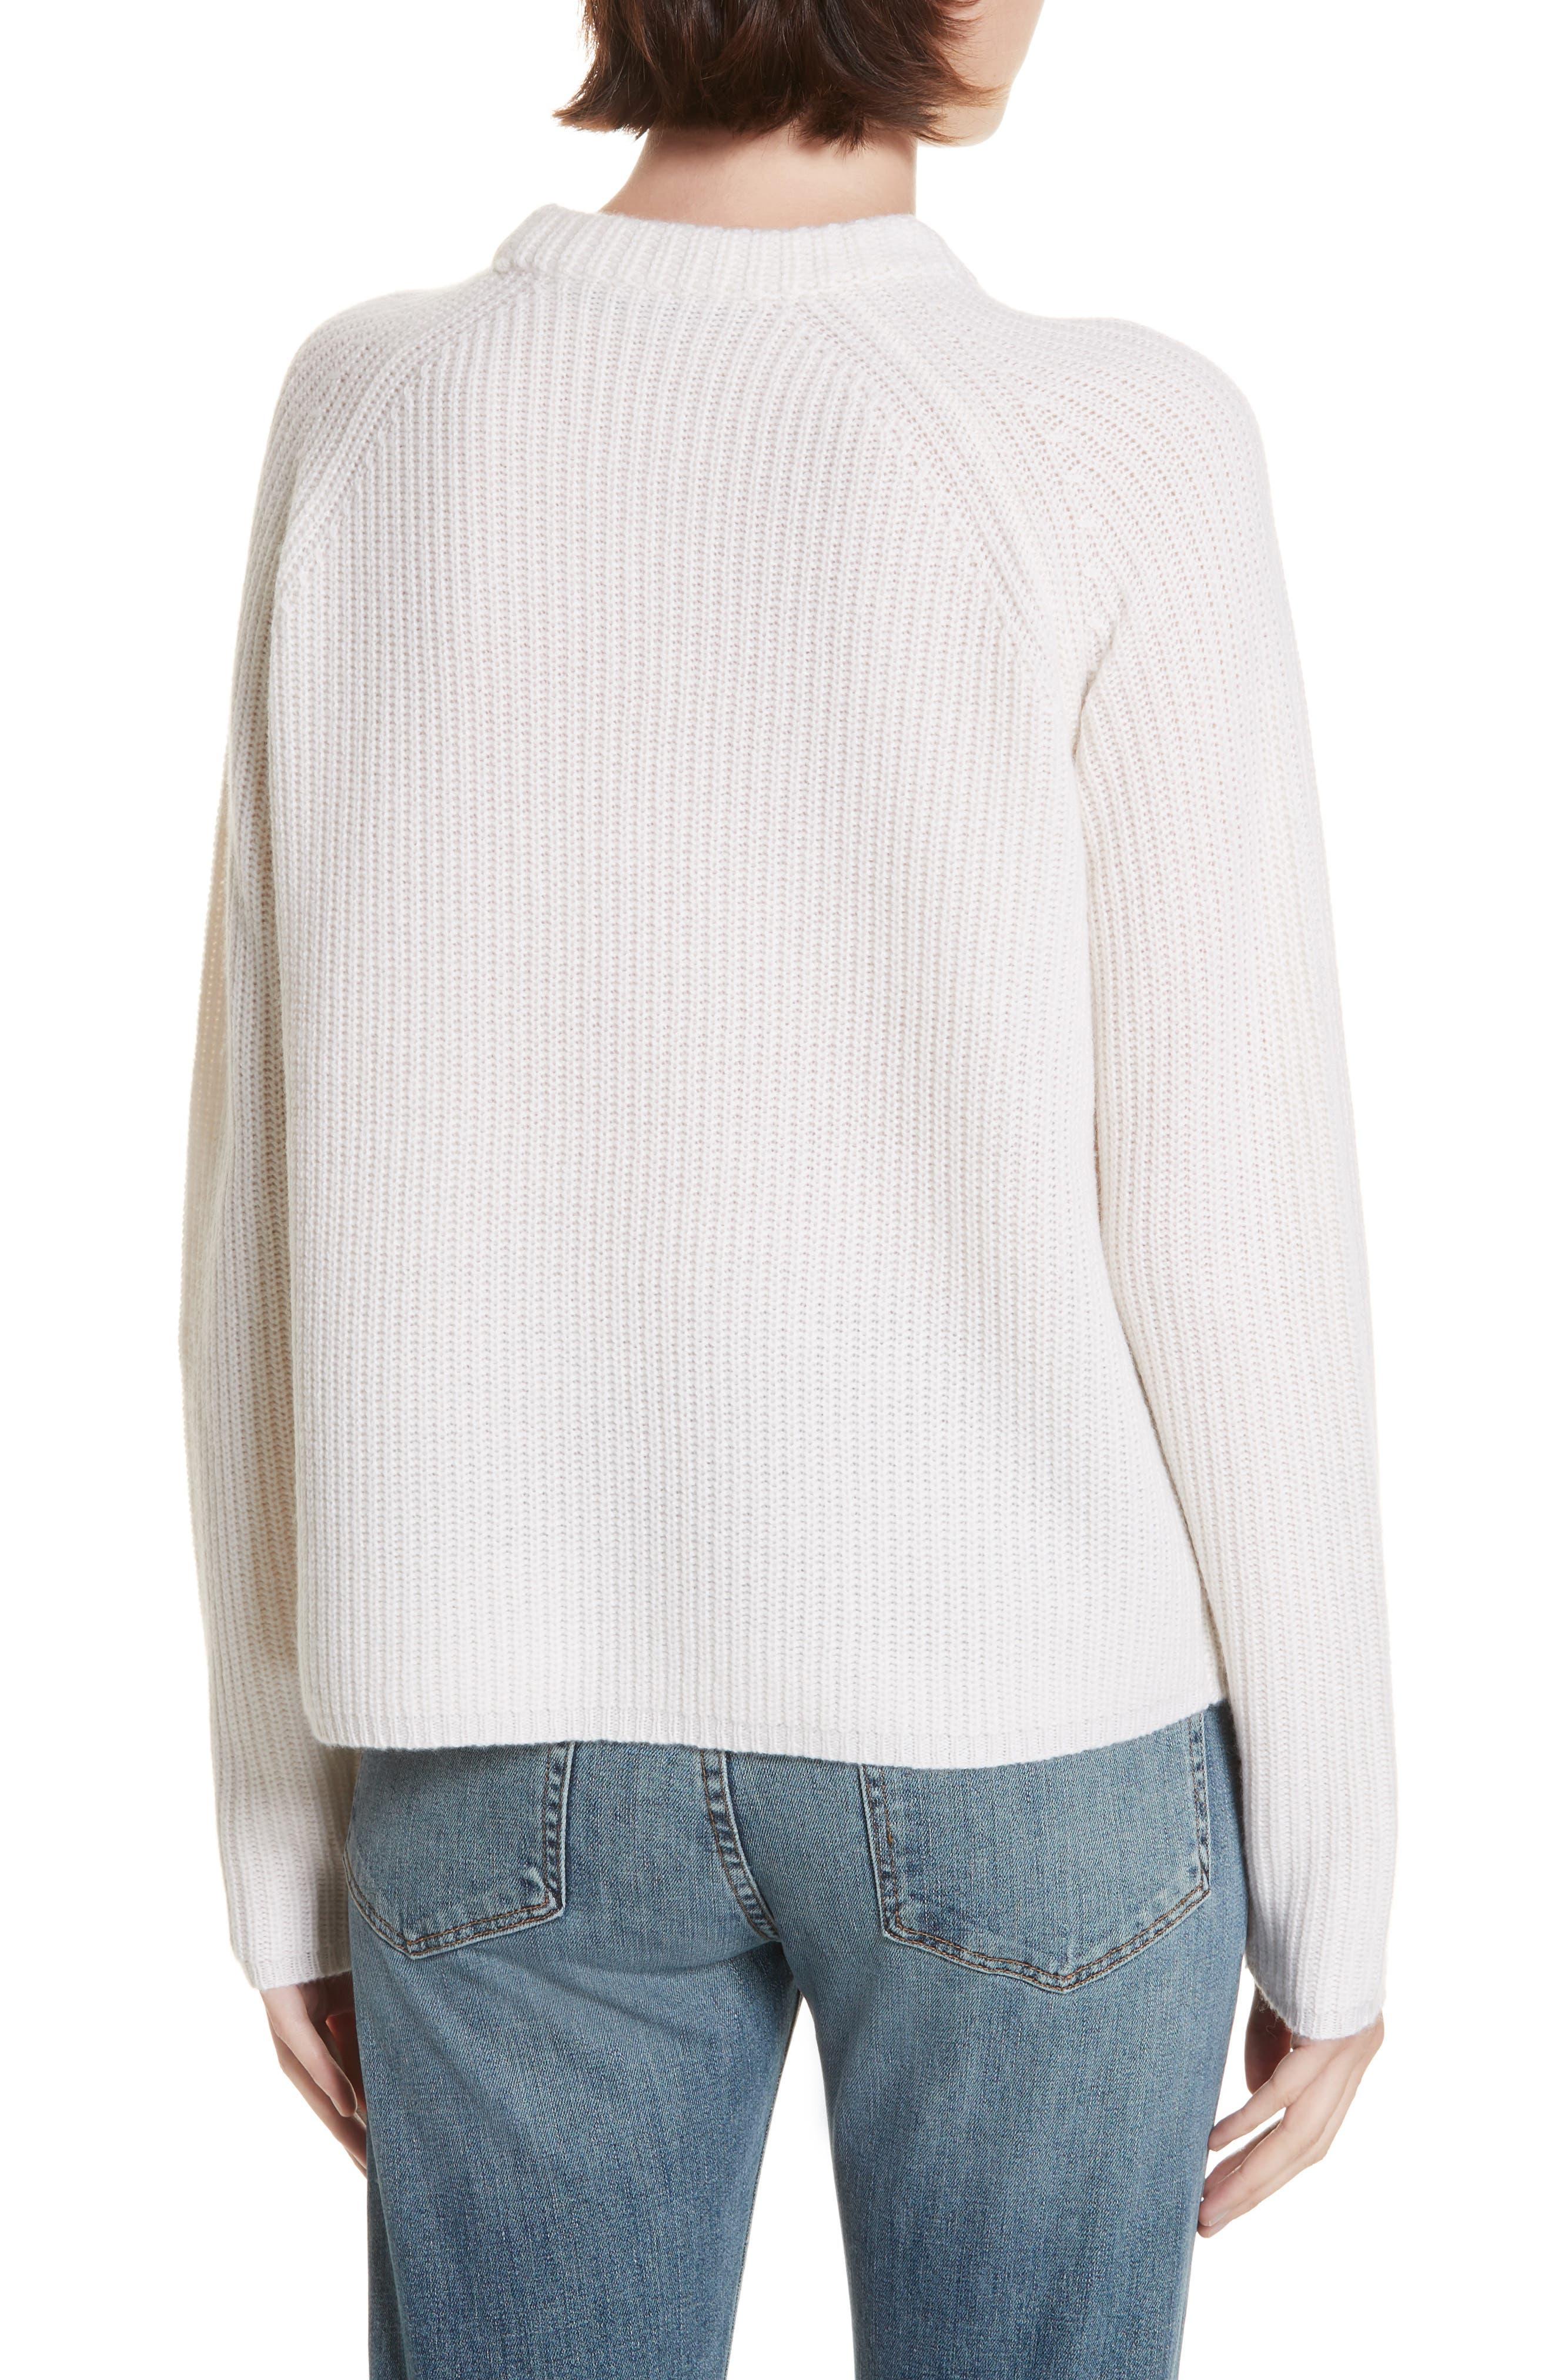 Fisherman Crewneck Cashmere Sweater,                             Alternate thumbnail 2, color,                             IVORY